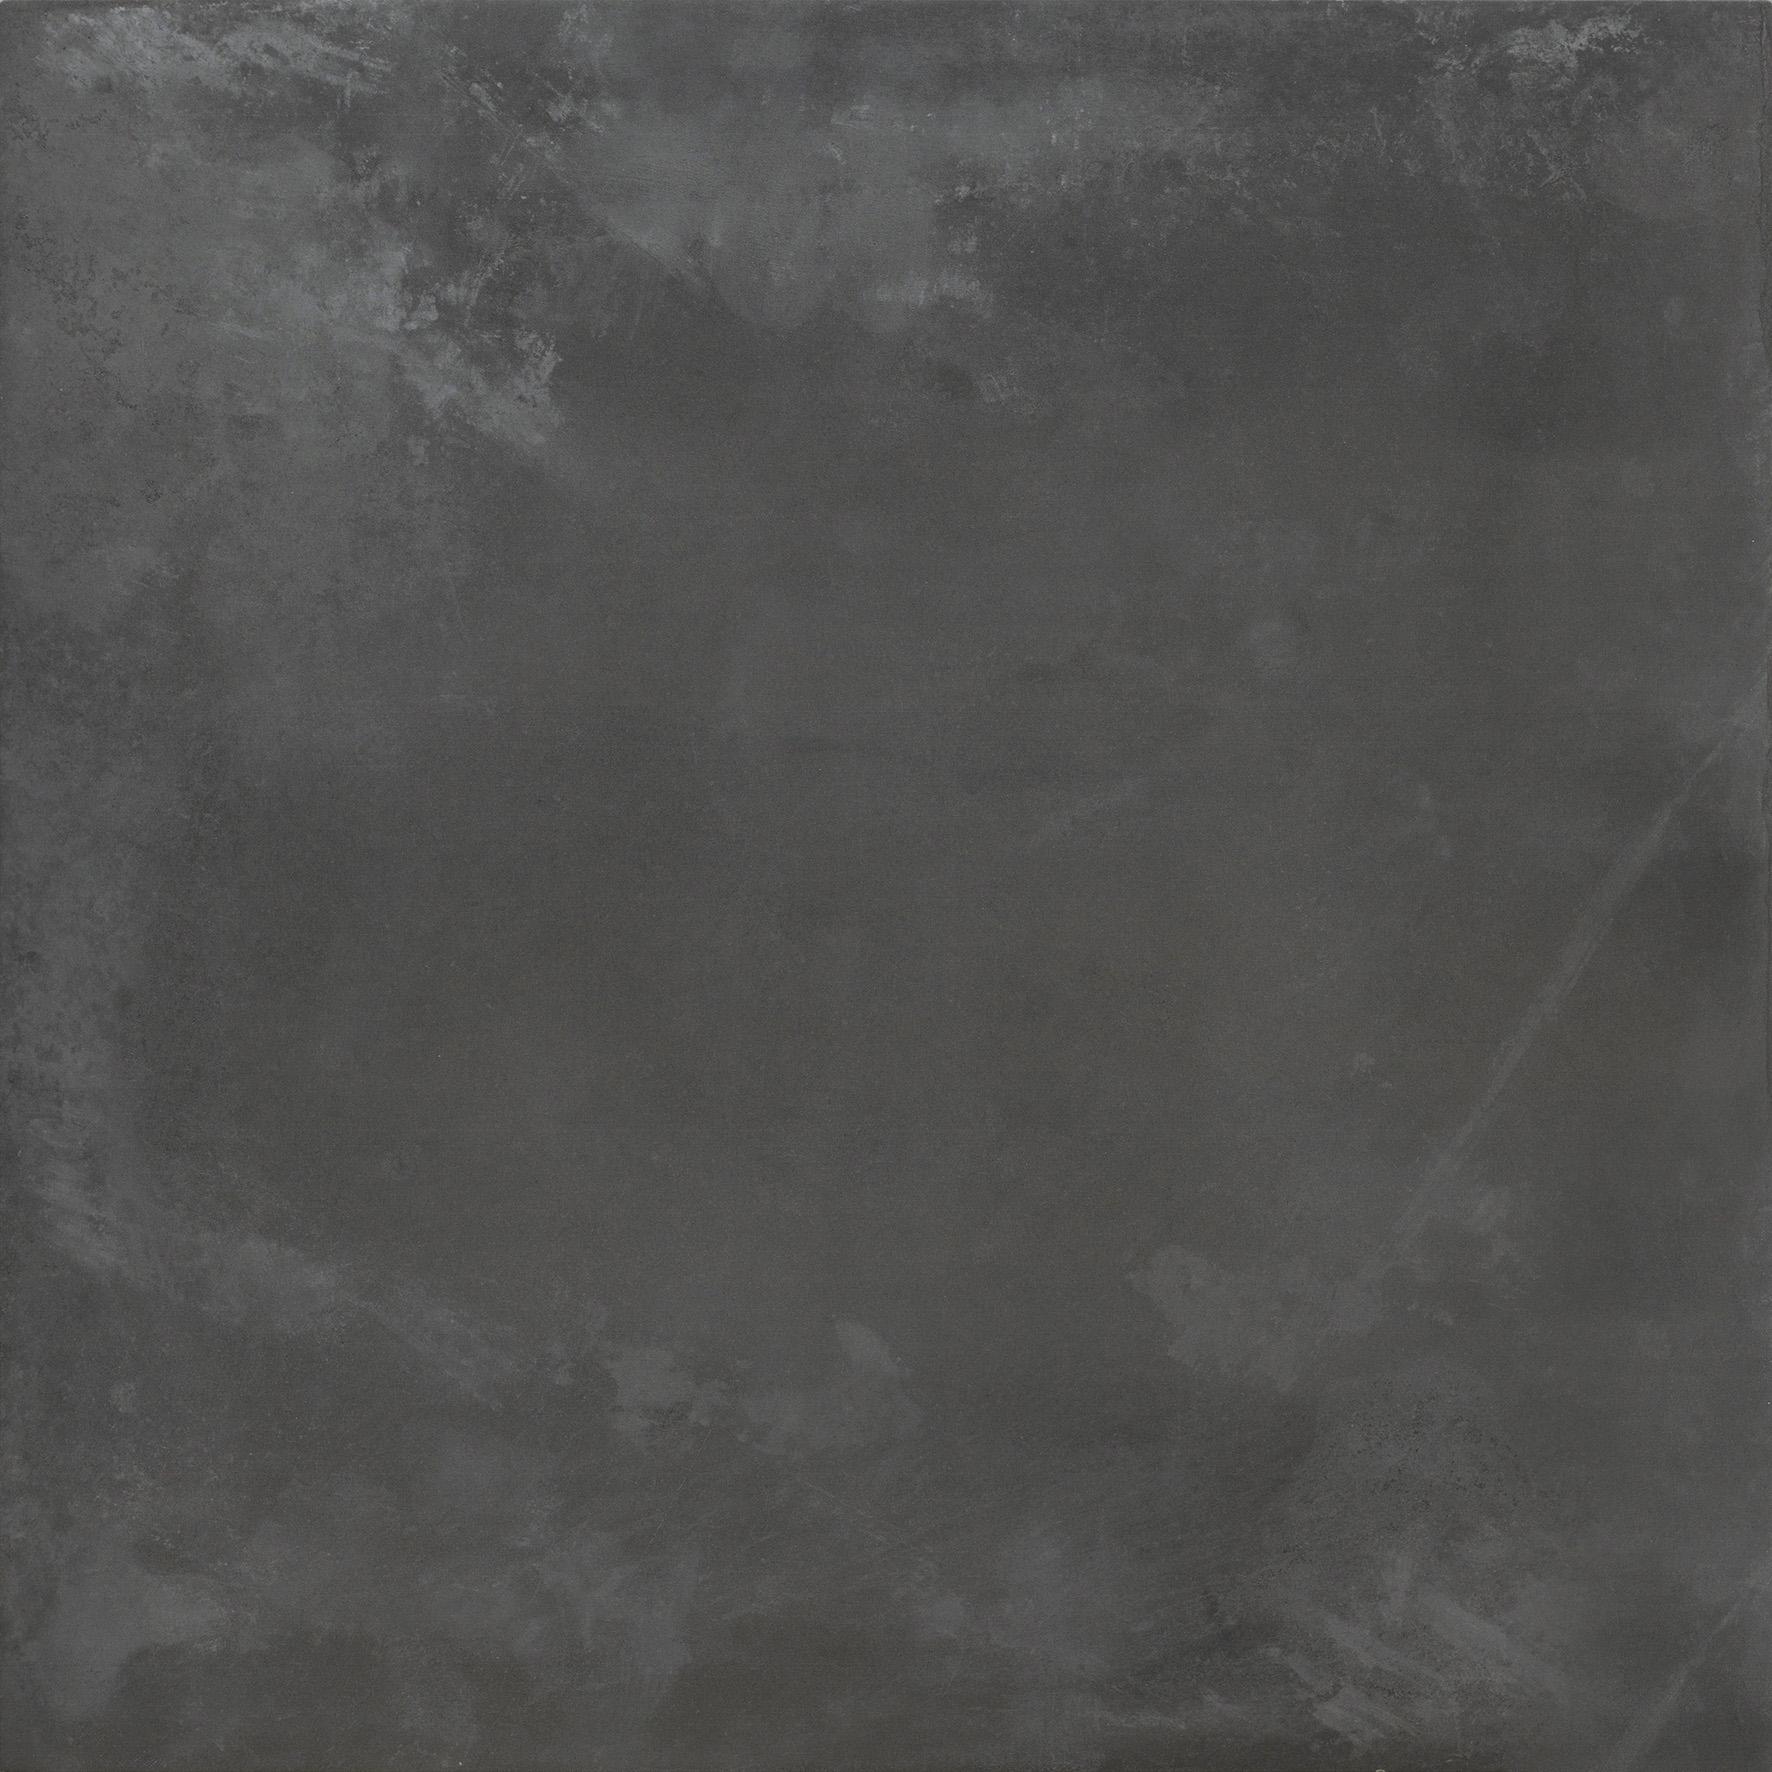 Keramische Tuintegel 80x80.Geoceramica Concreet Black Keramische Tegel 80x80 Dikte 4 Cm